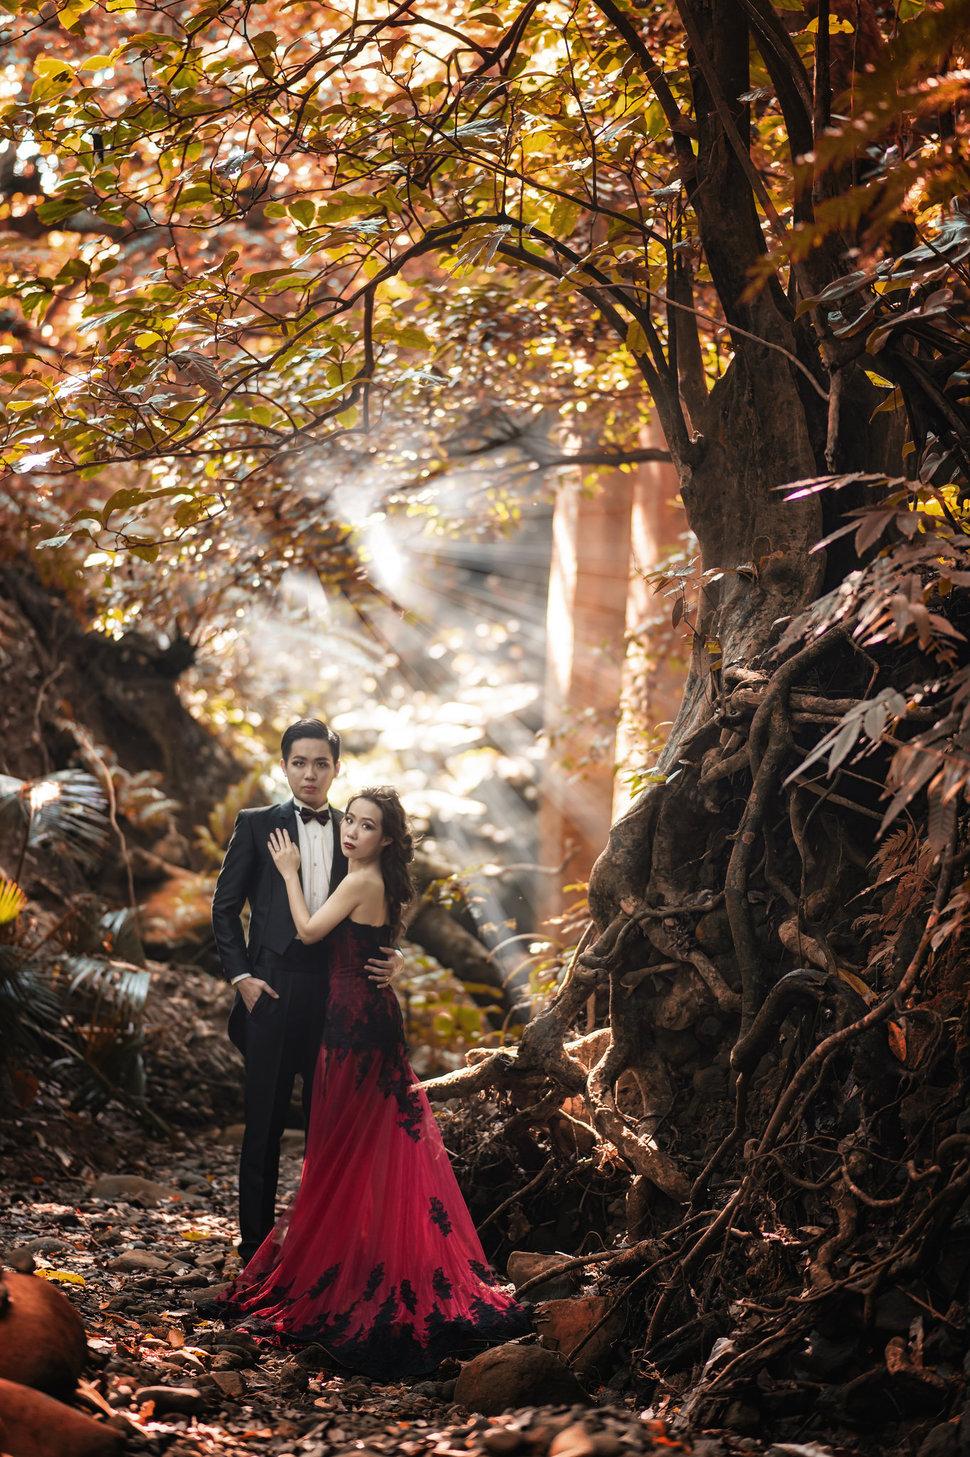 [自助婚紗]Lewis & Demi @蘭嶼(編號:469741) - J&E Image Studio - 結婚吧